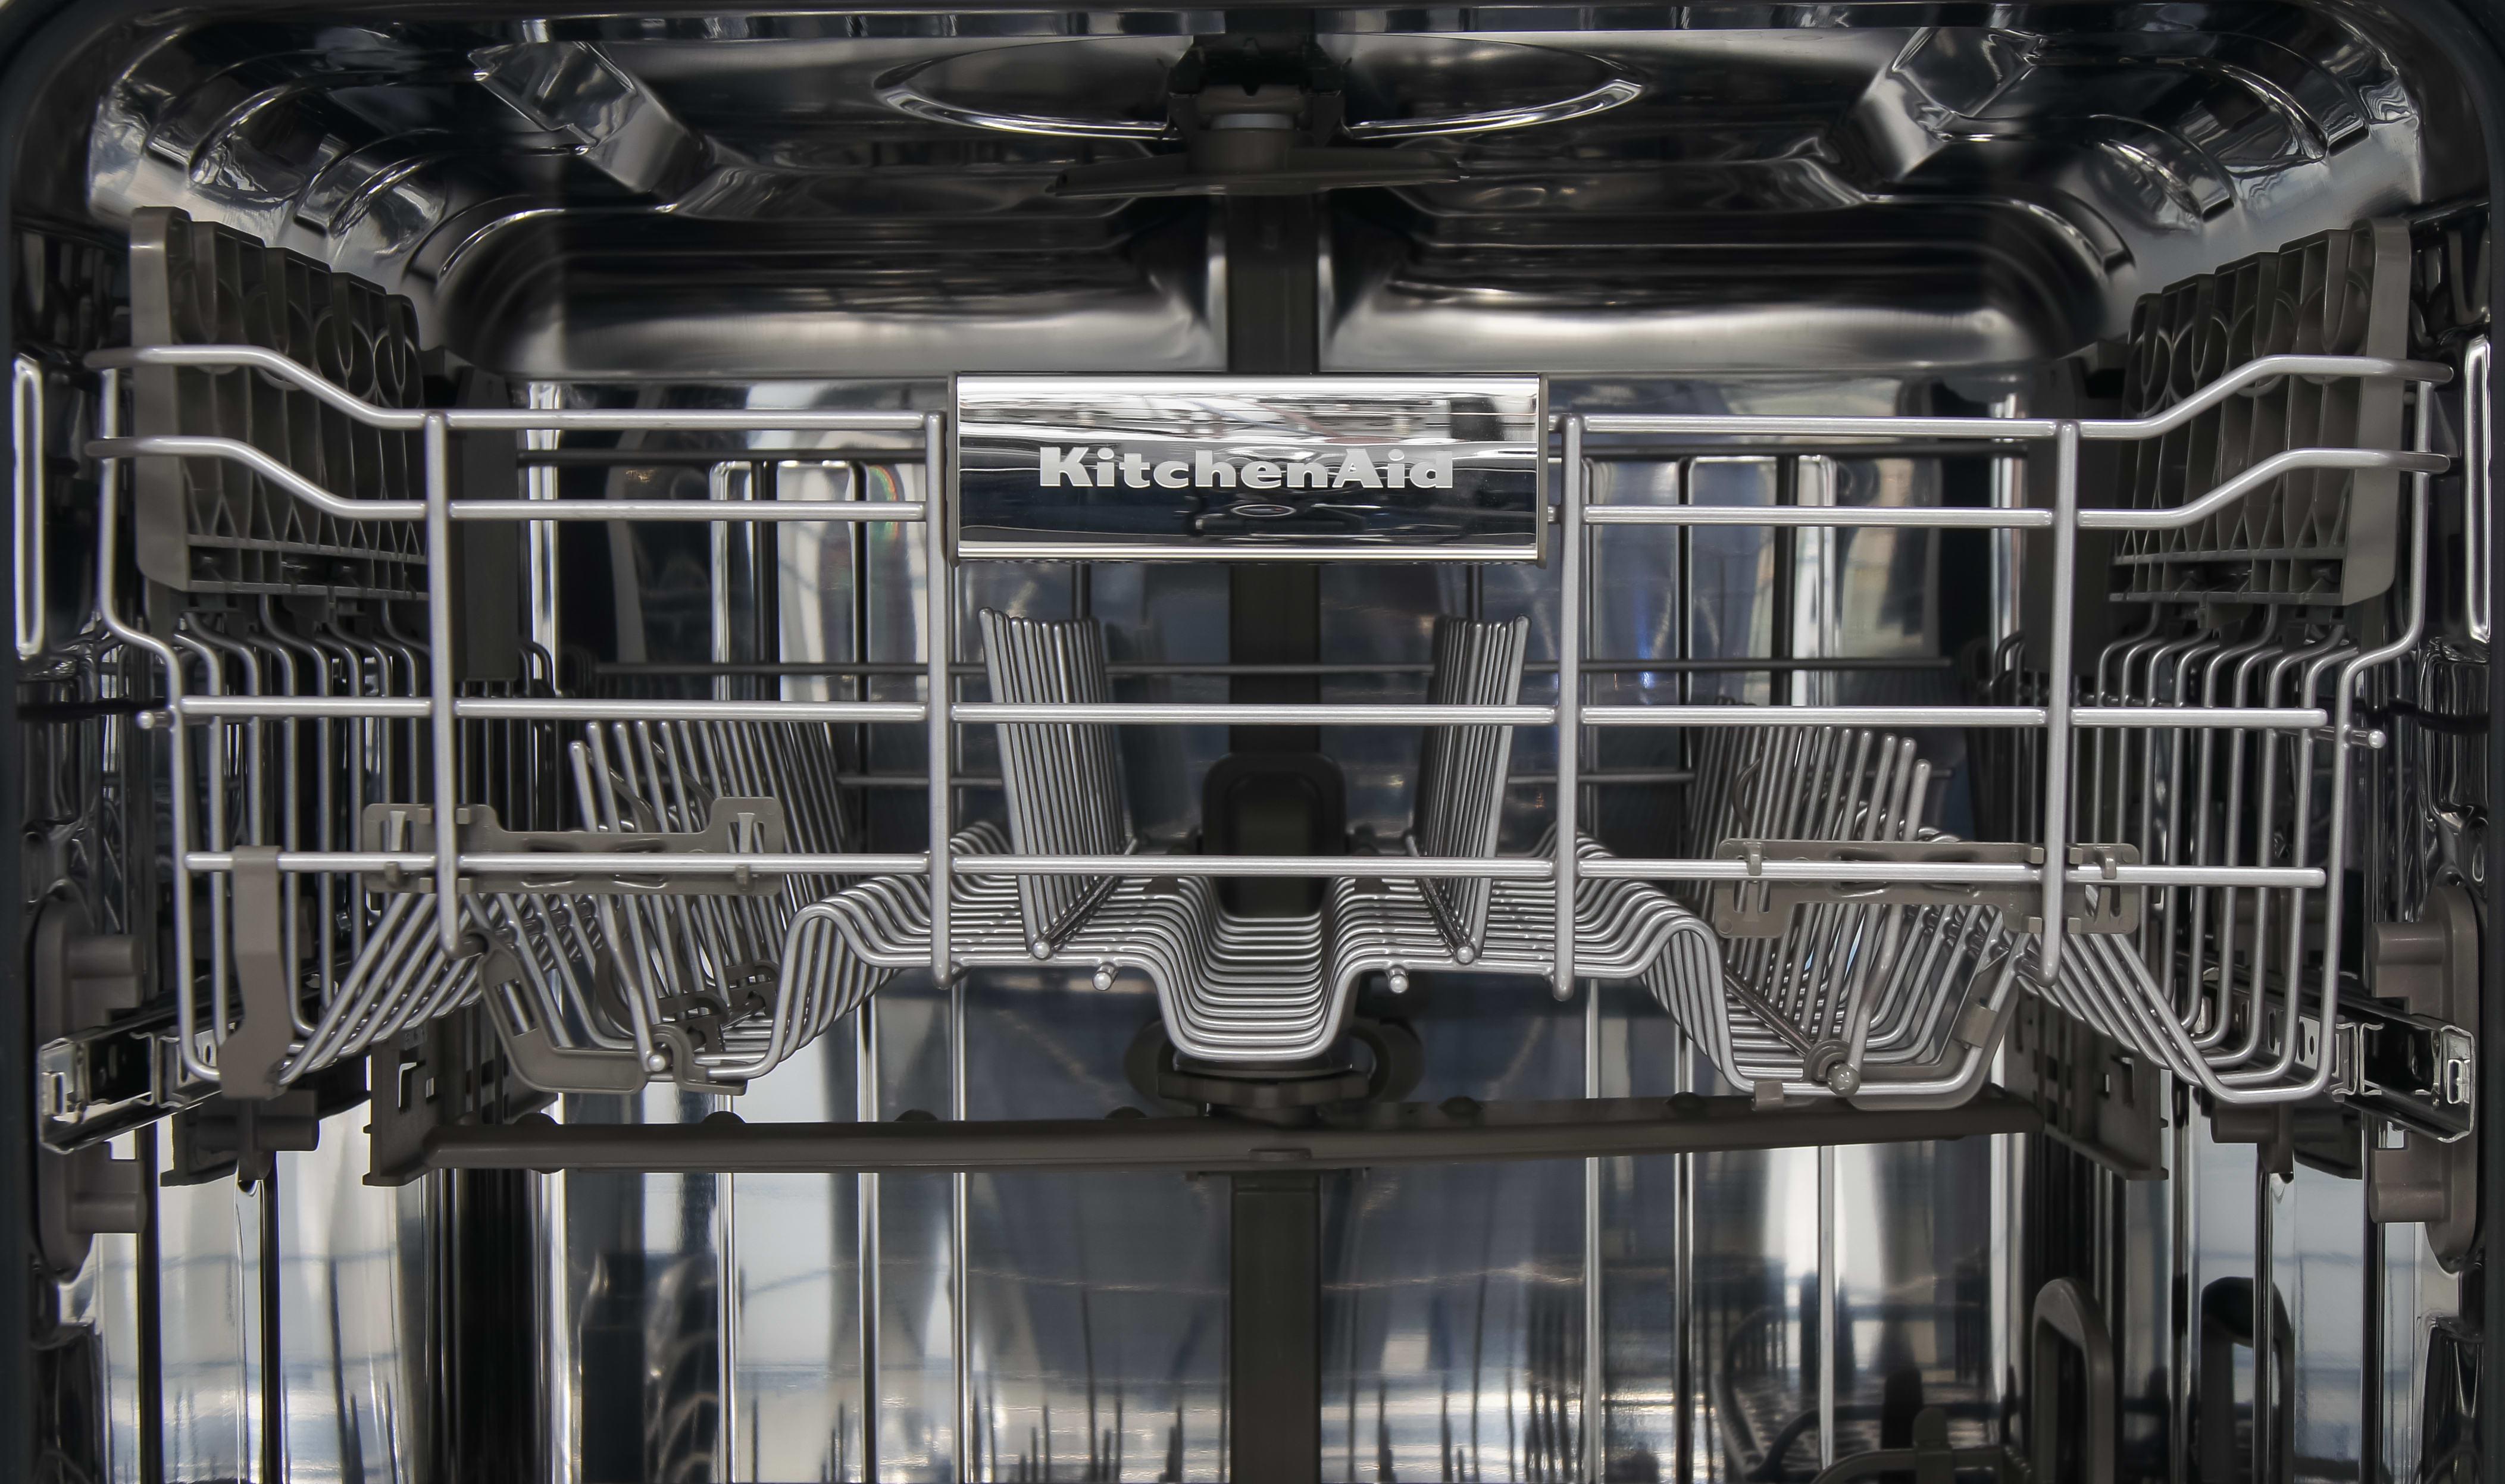 kitchenaid architect series ii kdtm354dss dishwasher review dishwashers. Black Bedroom Furniture Sets. Home Design Ideas